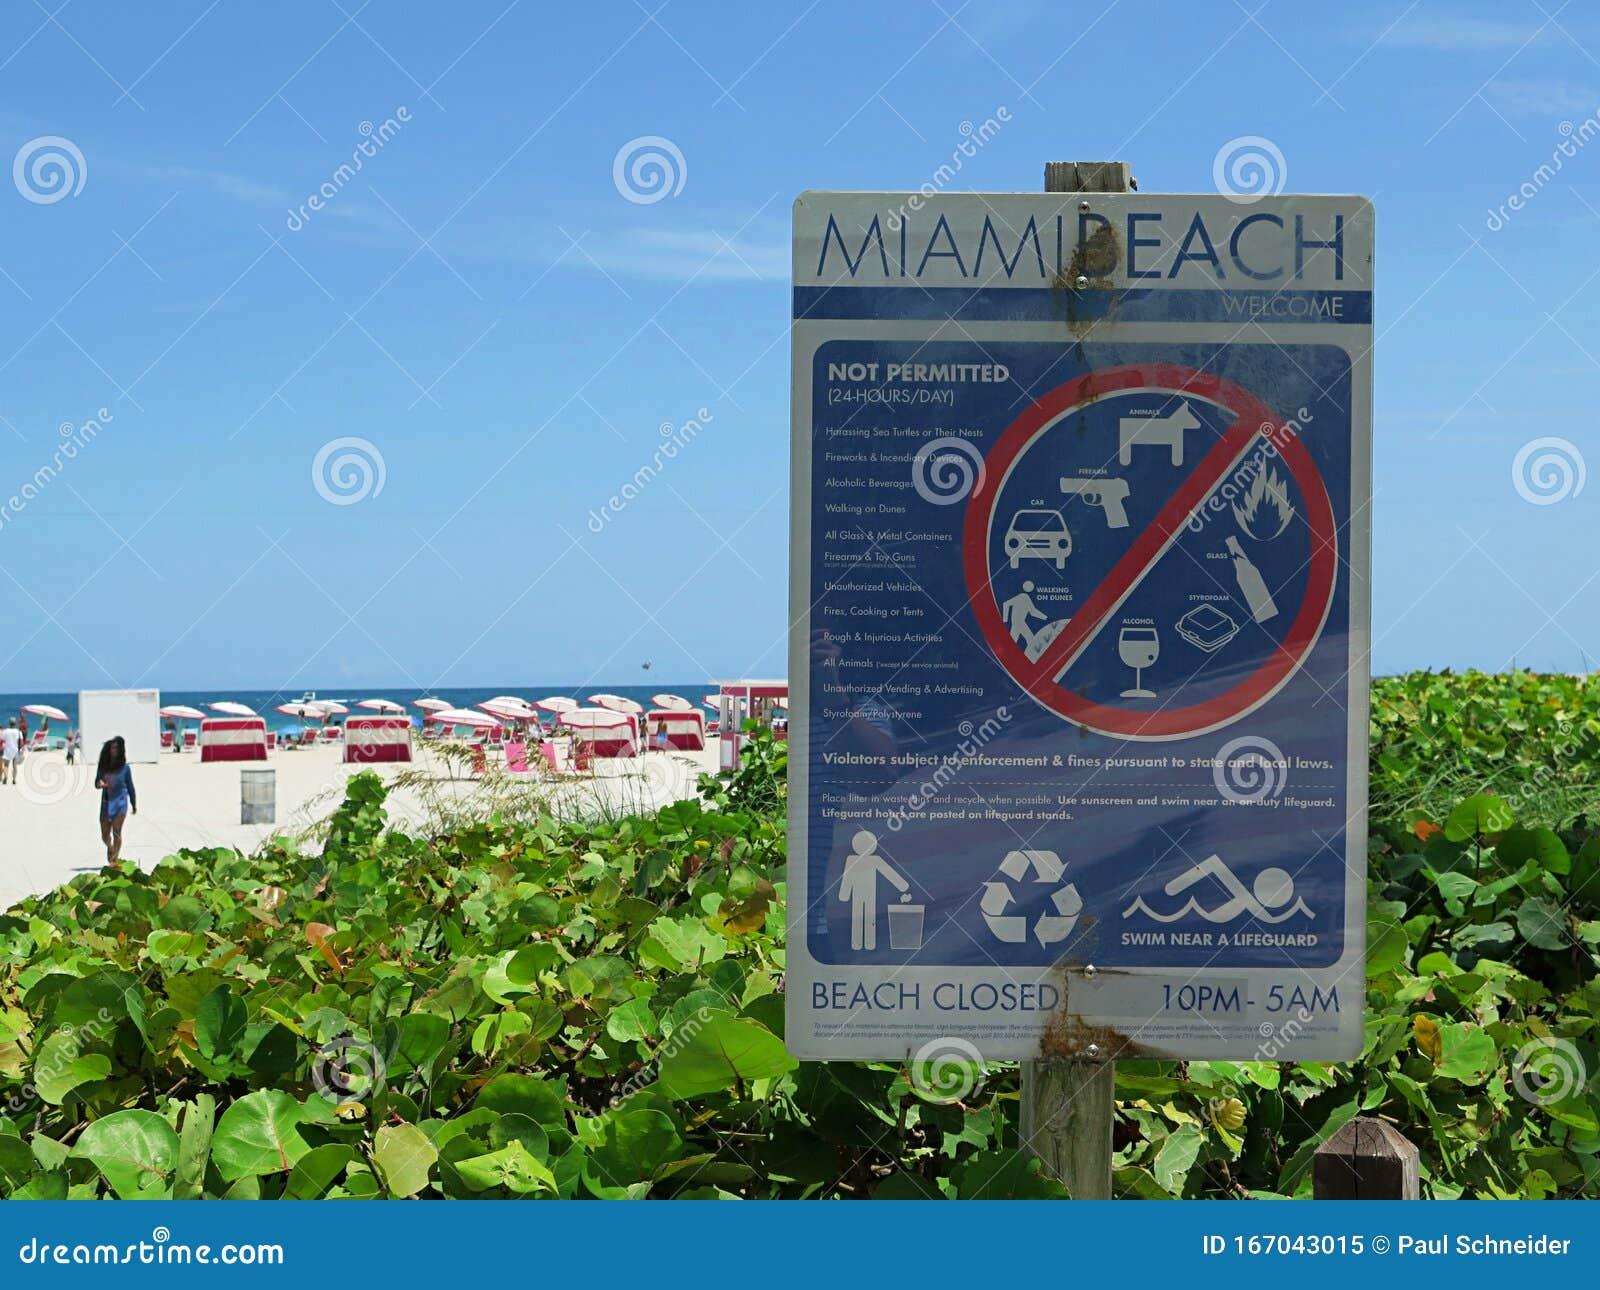 miami beach - 17.08.2019: signage at miami beach editorial